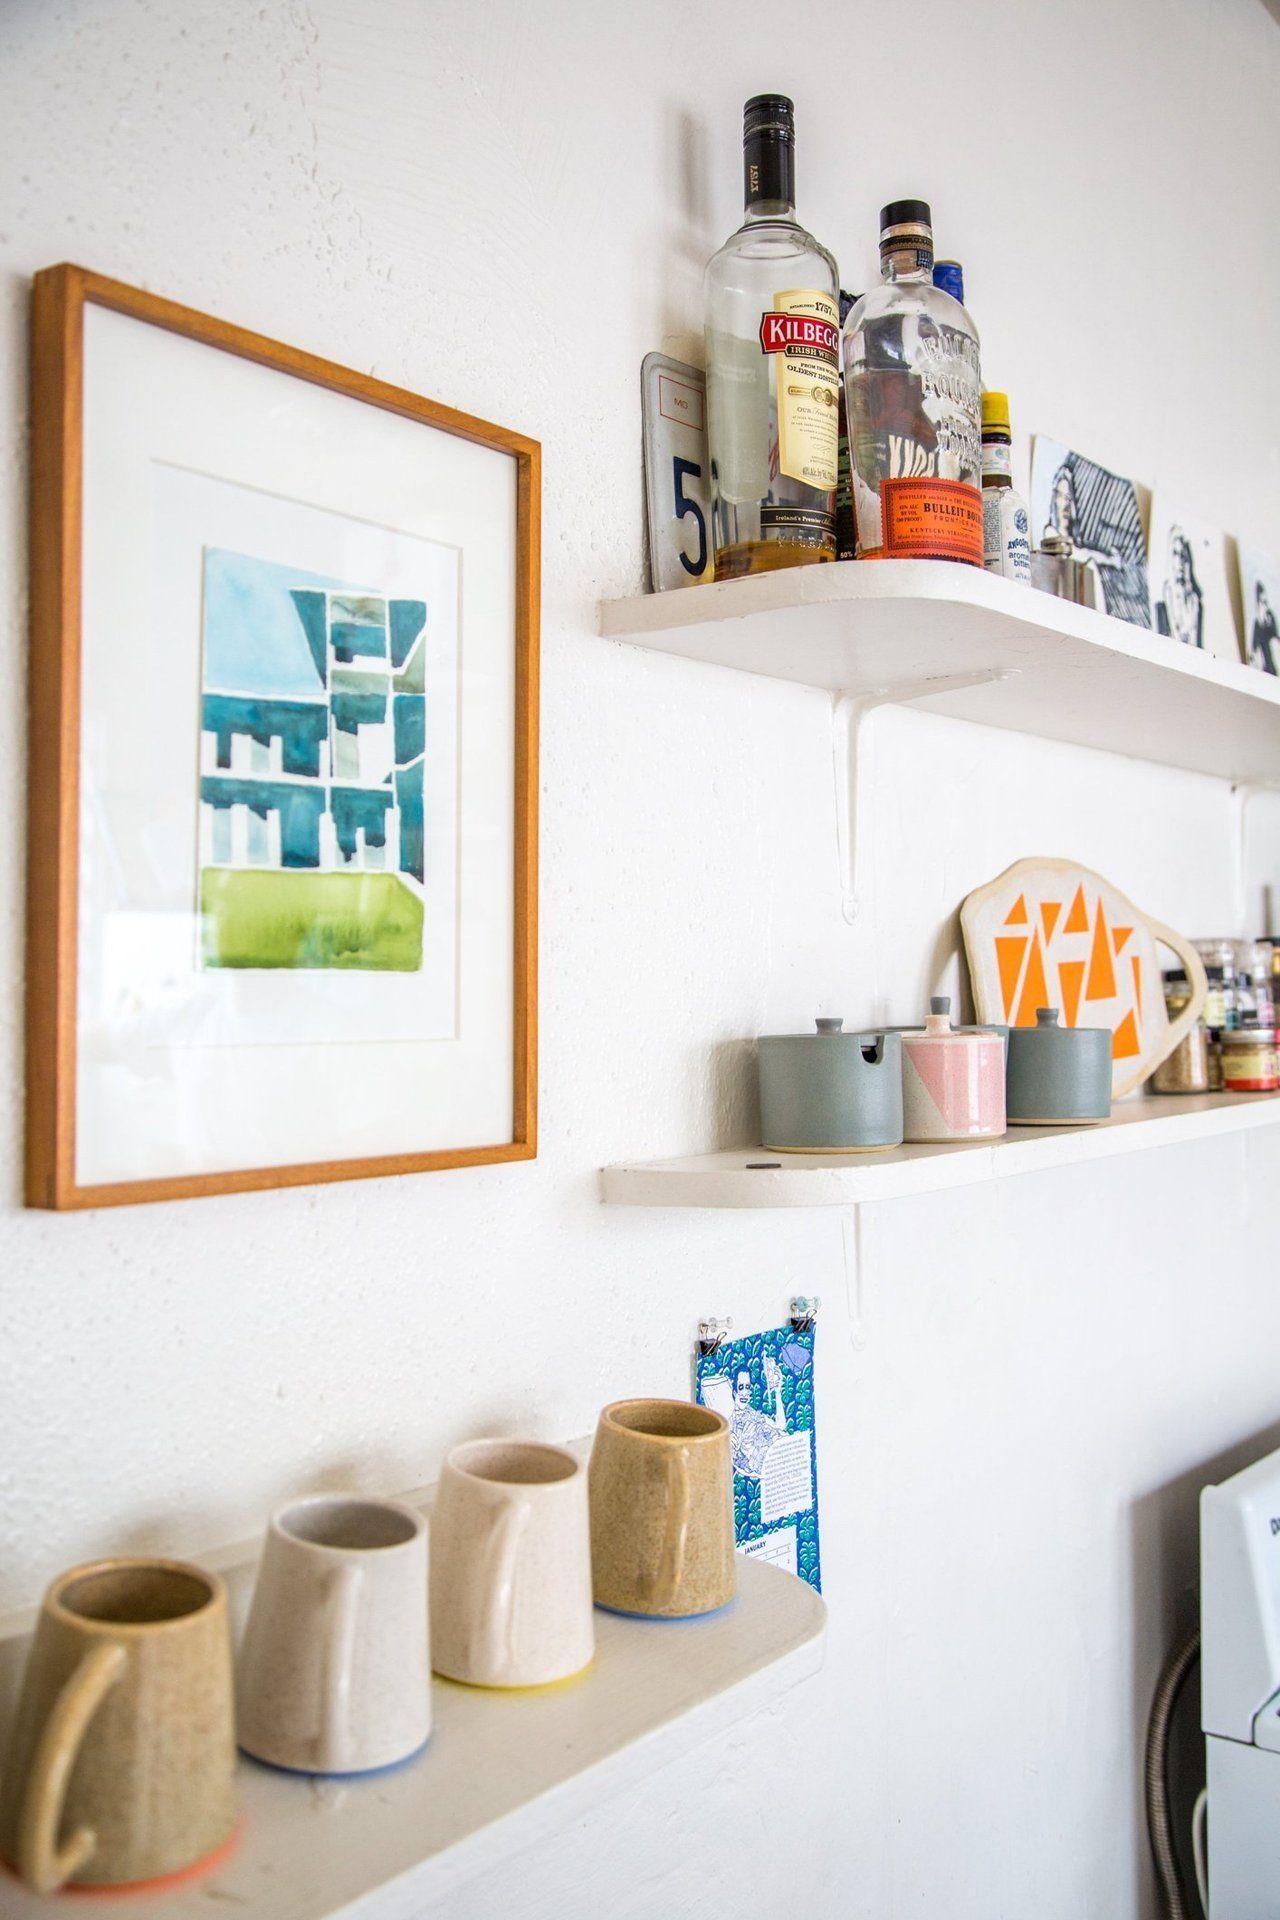 Nick's AllinOne Home & Studio Art studio at home